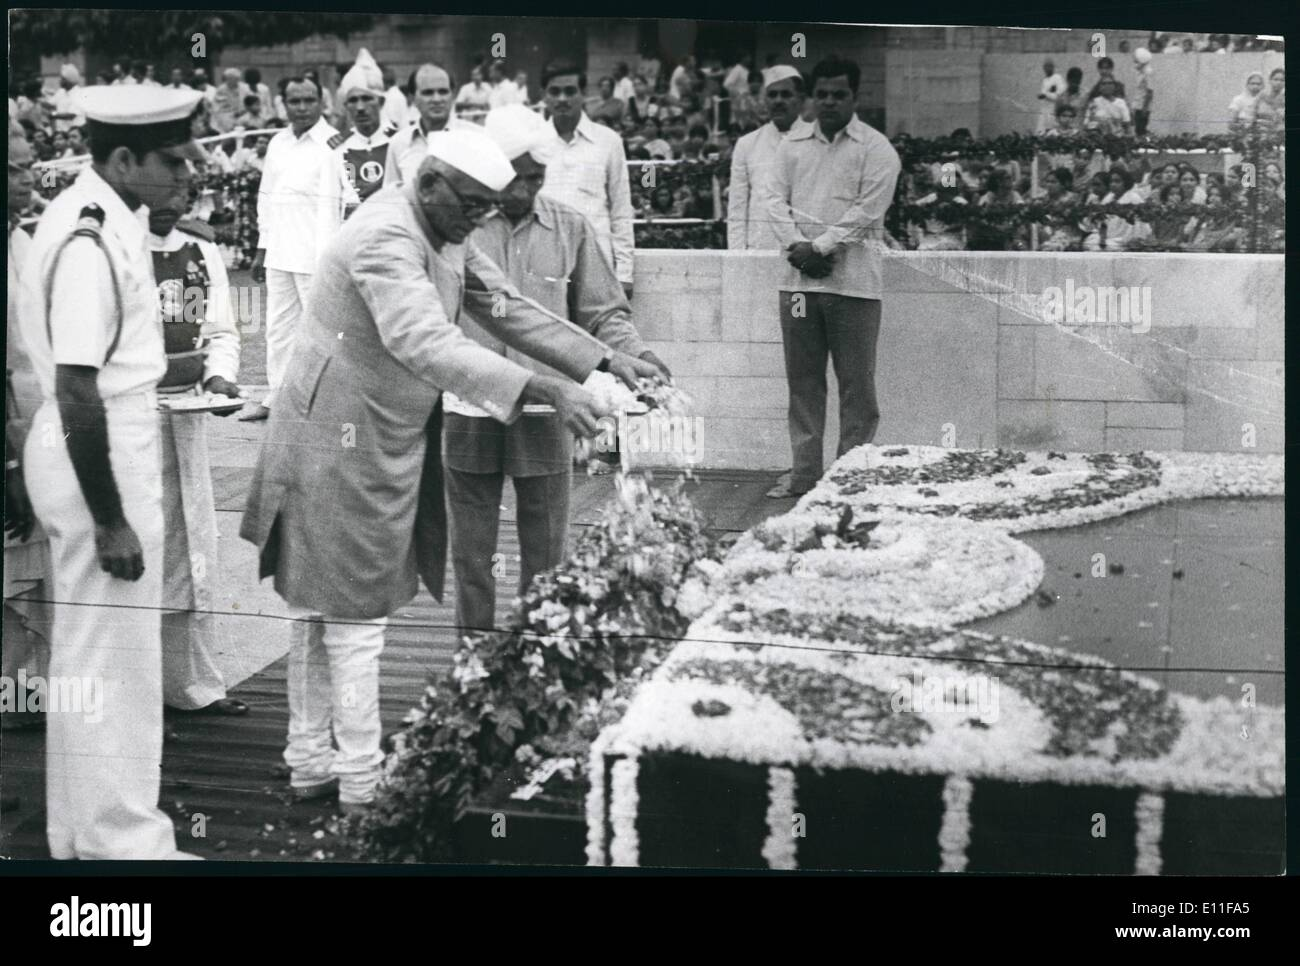 Oct. 10, 1977 - President Neelam Sanjiva Reddy paying homage at Mahatma Gandhi;'s (Father of the Nation) Shrine at Raj Ghat in New Delhi on Sunday morning - Stock Image